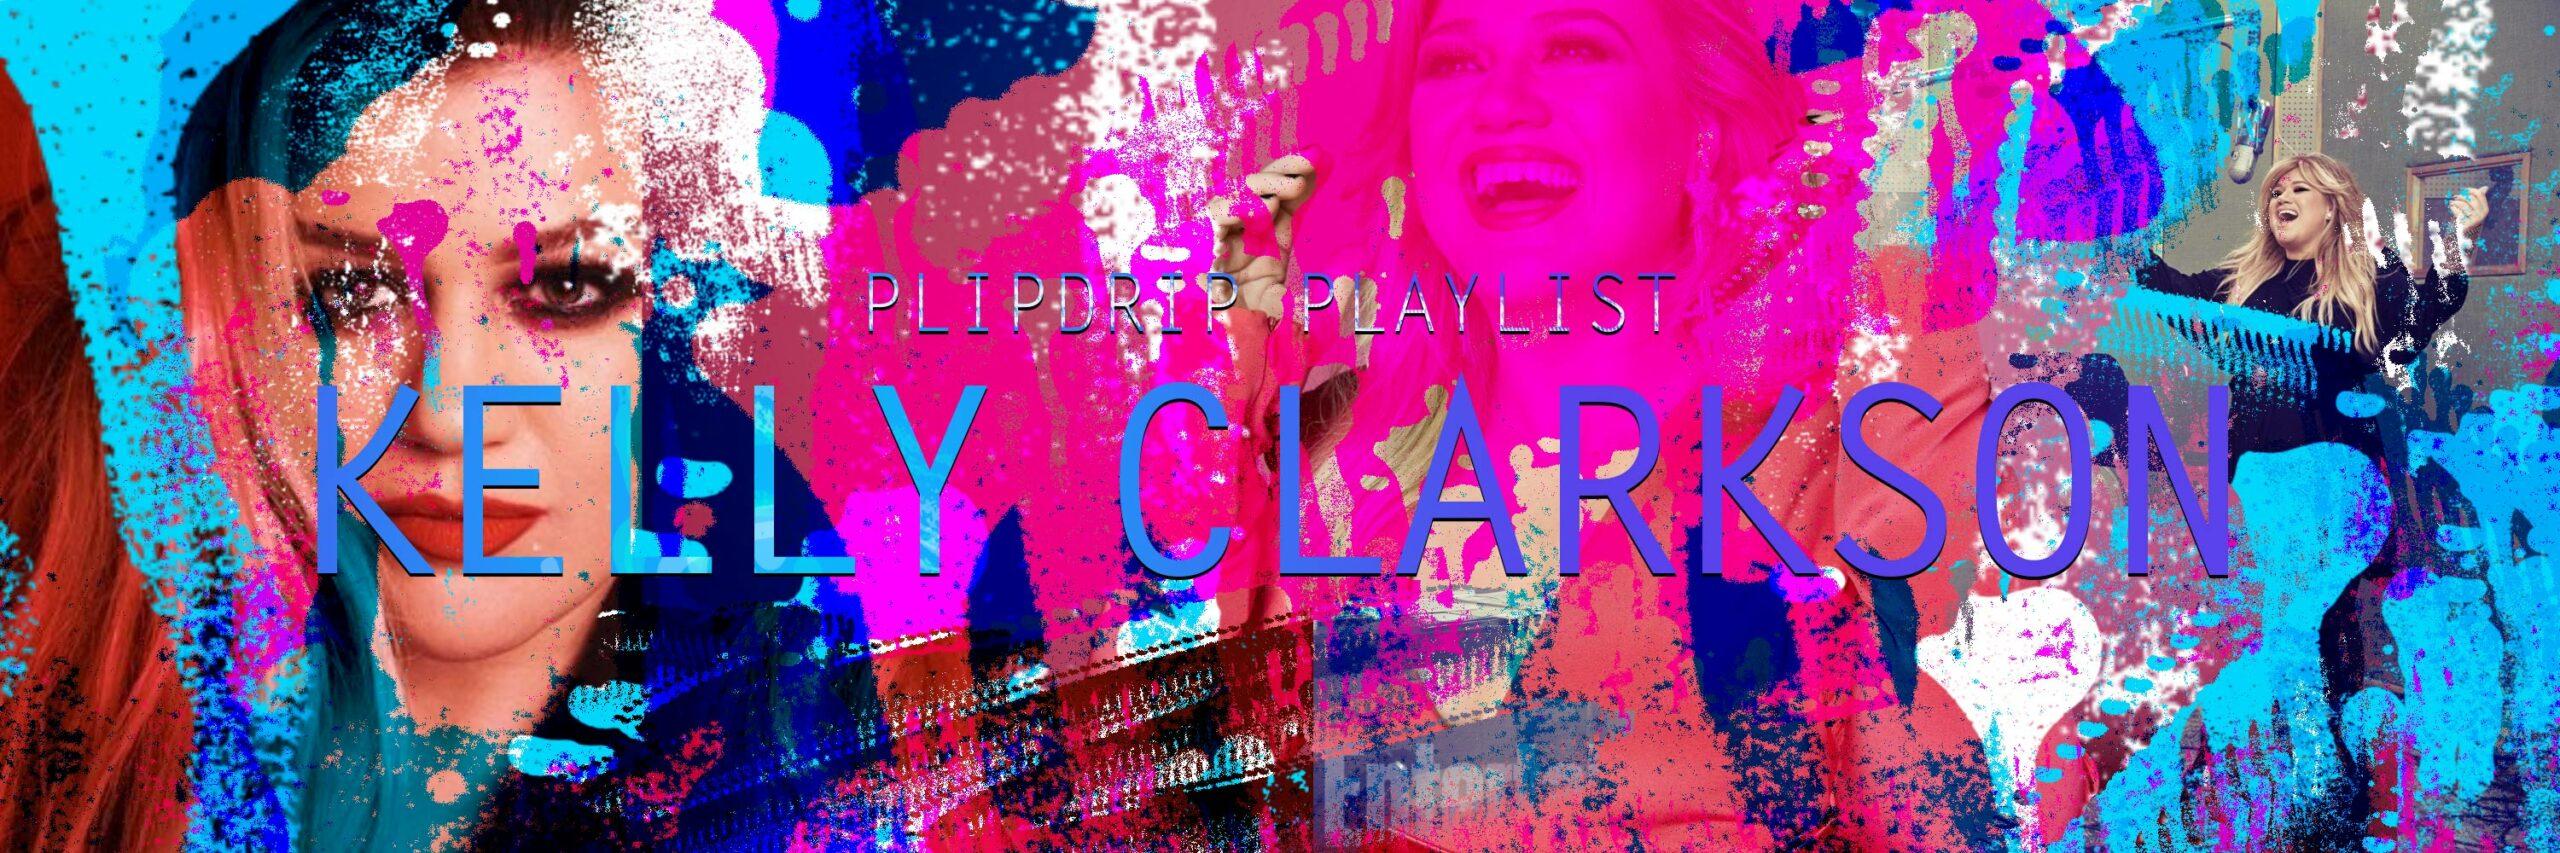 PF-kelly-clarkson-banner-1